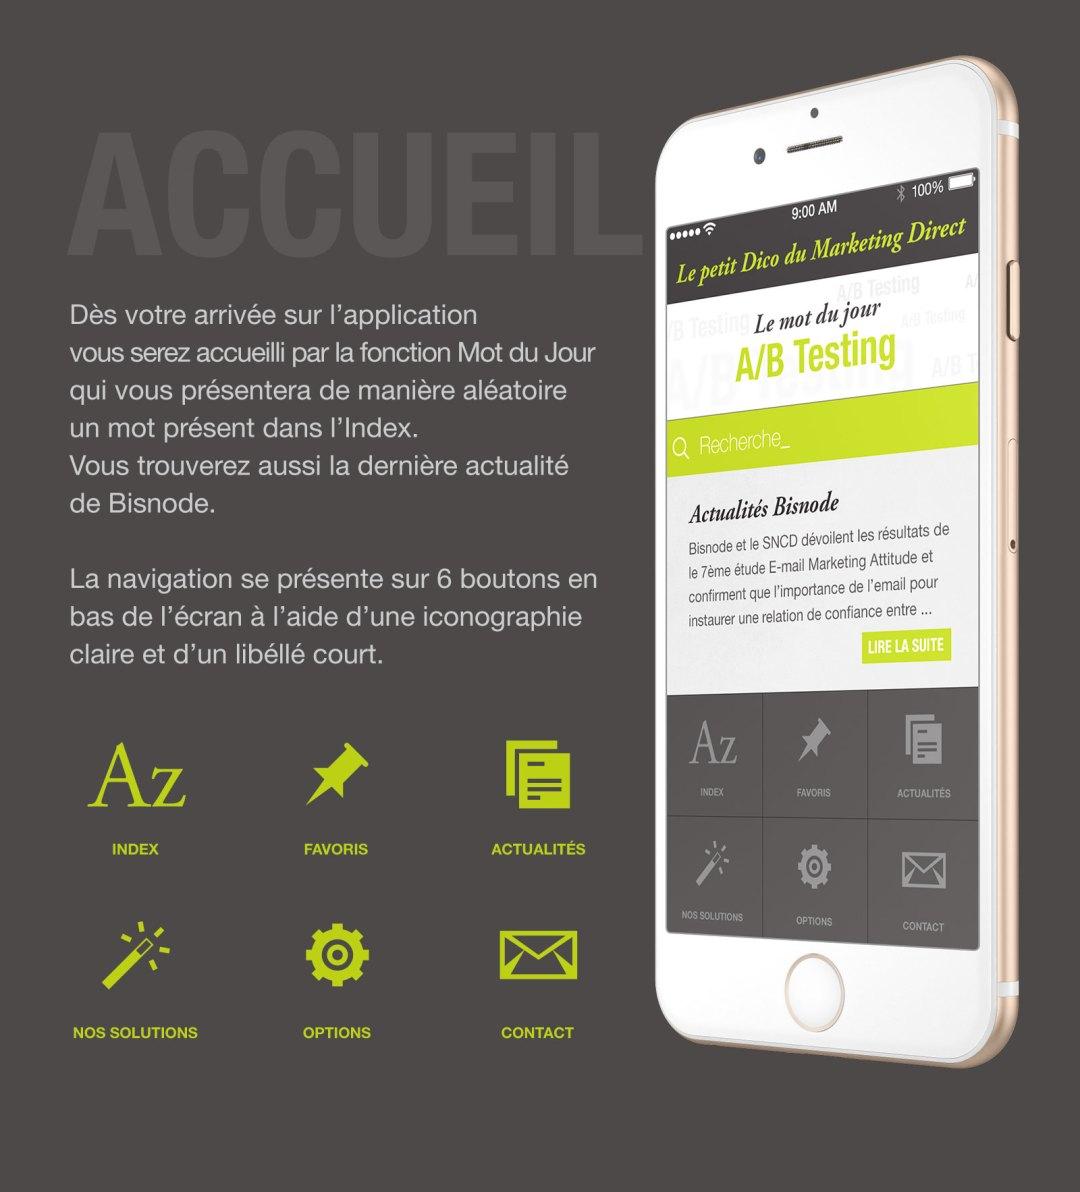 dico-app_02